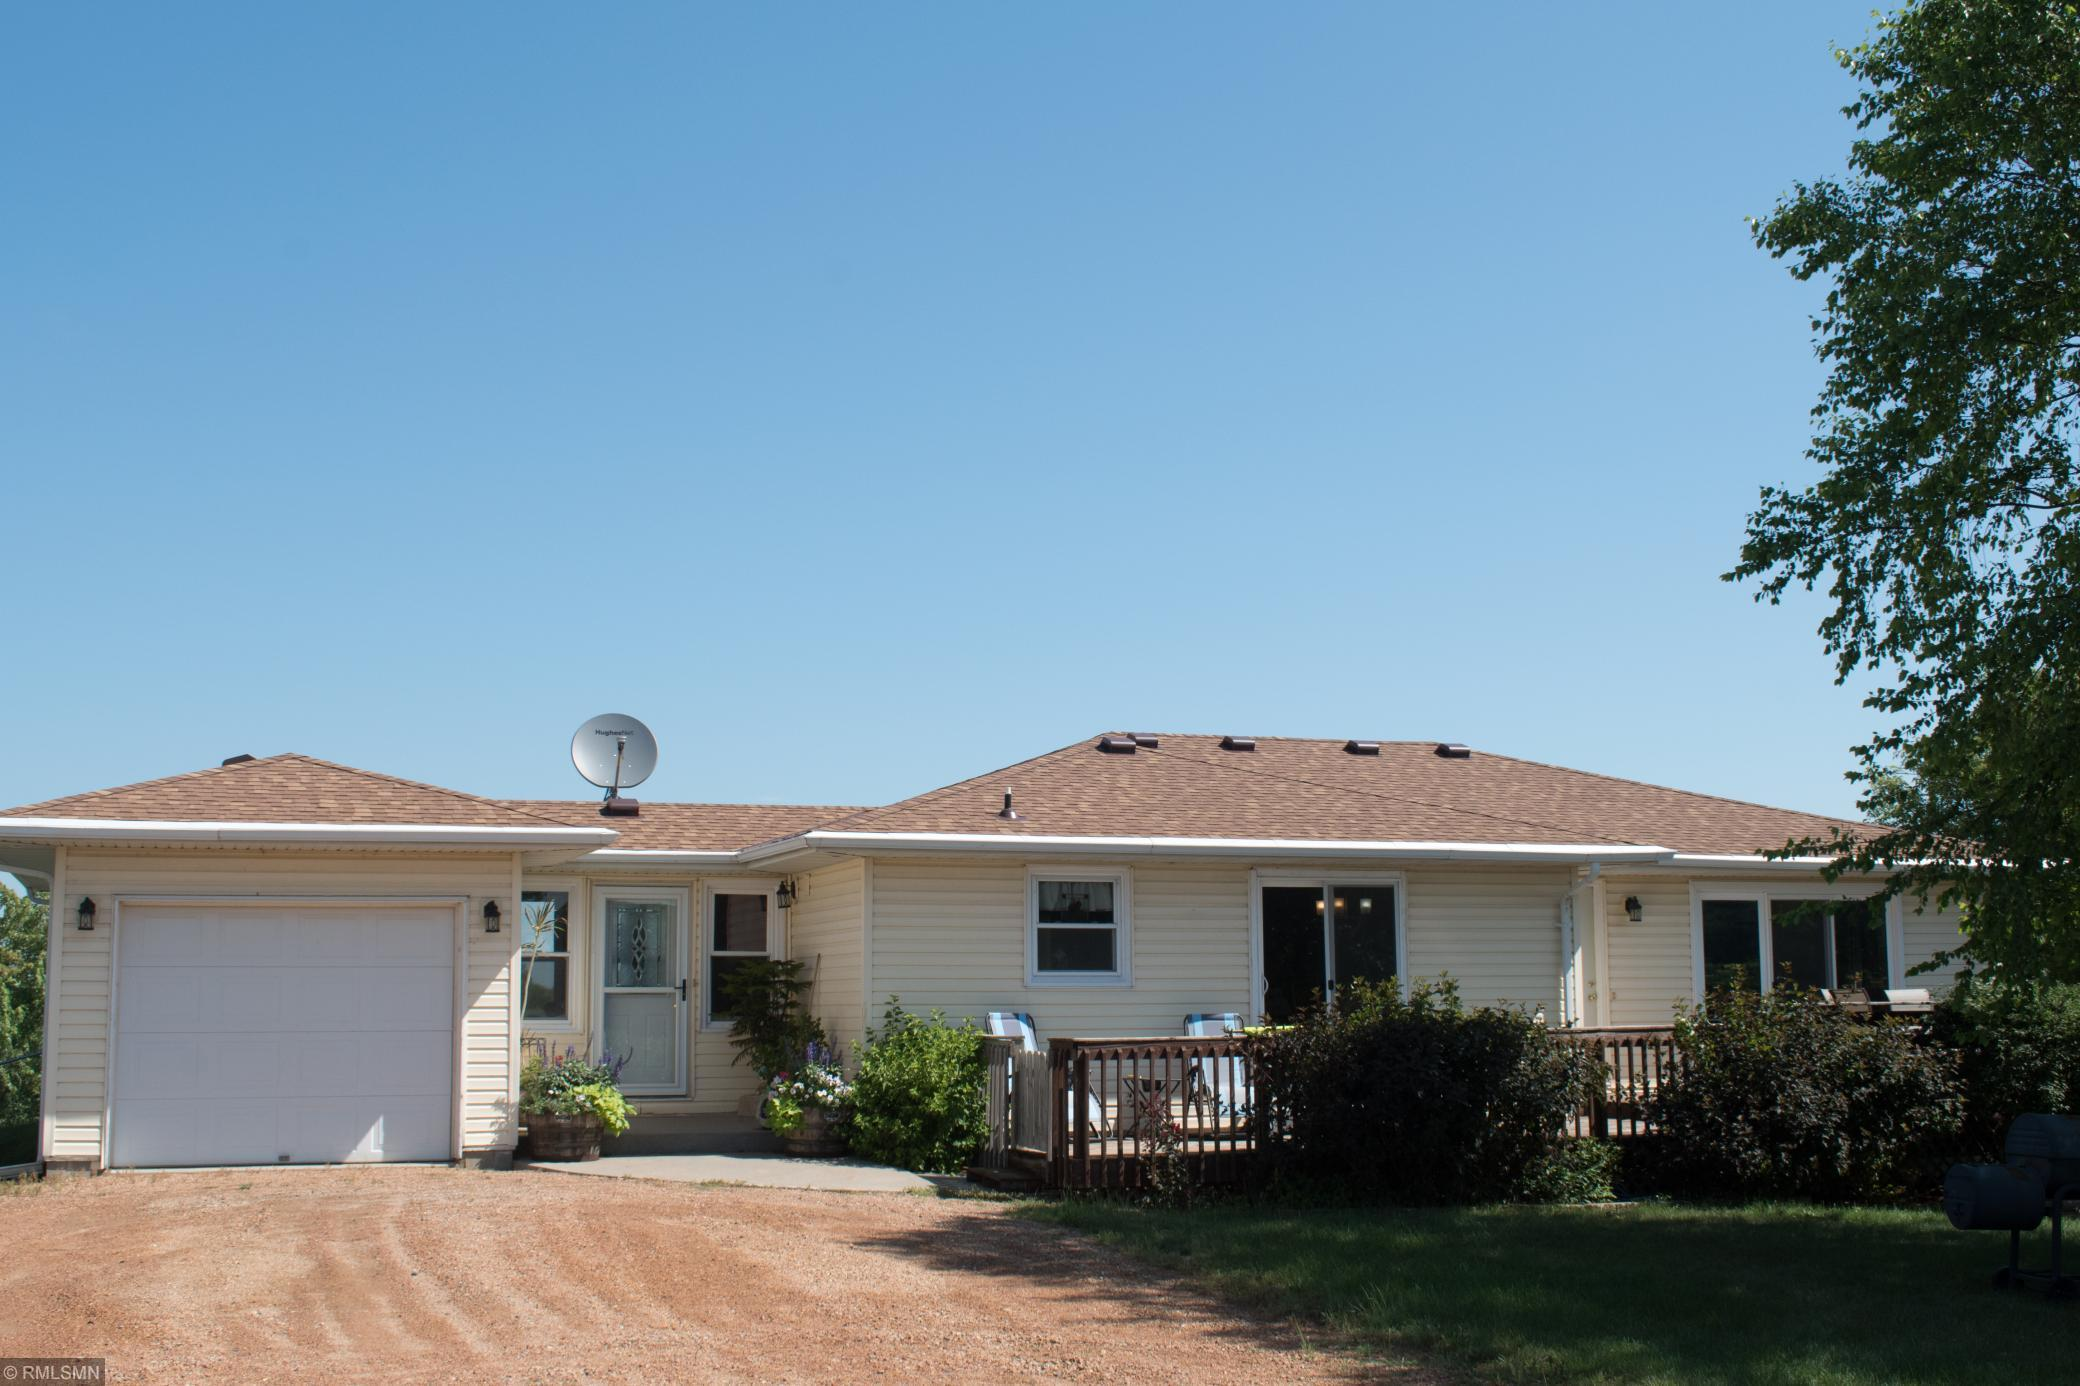 6430 160th Street Property Photo - Glencoe, MN real estate listing